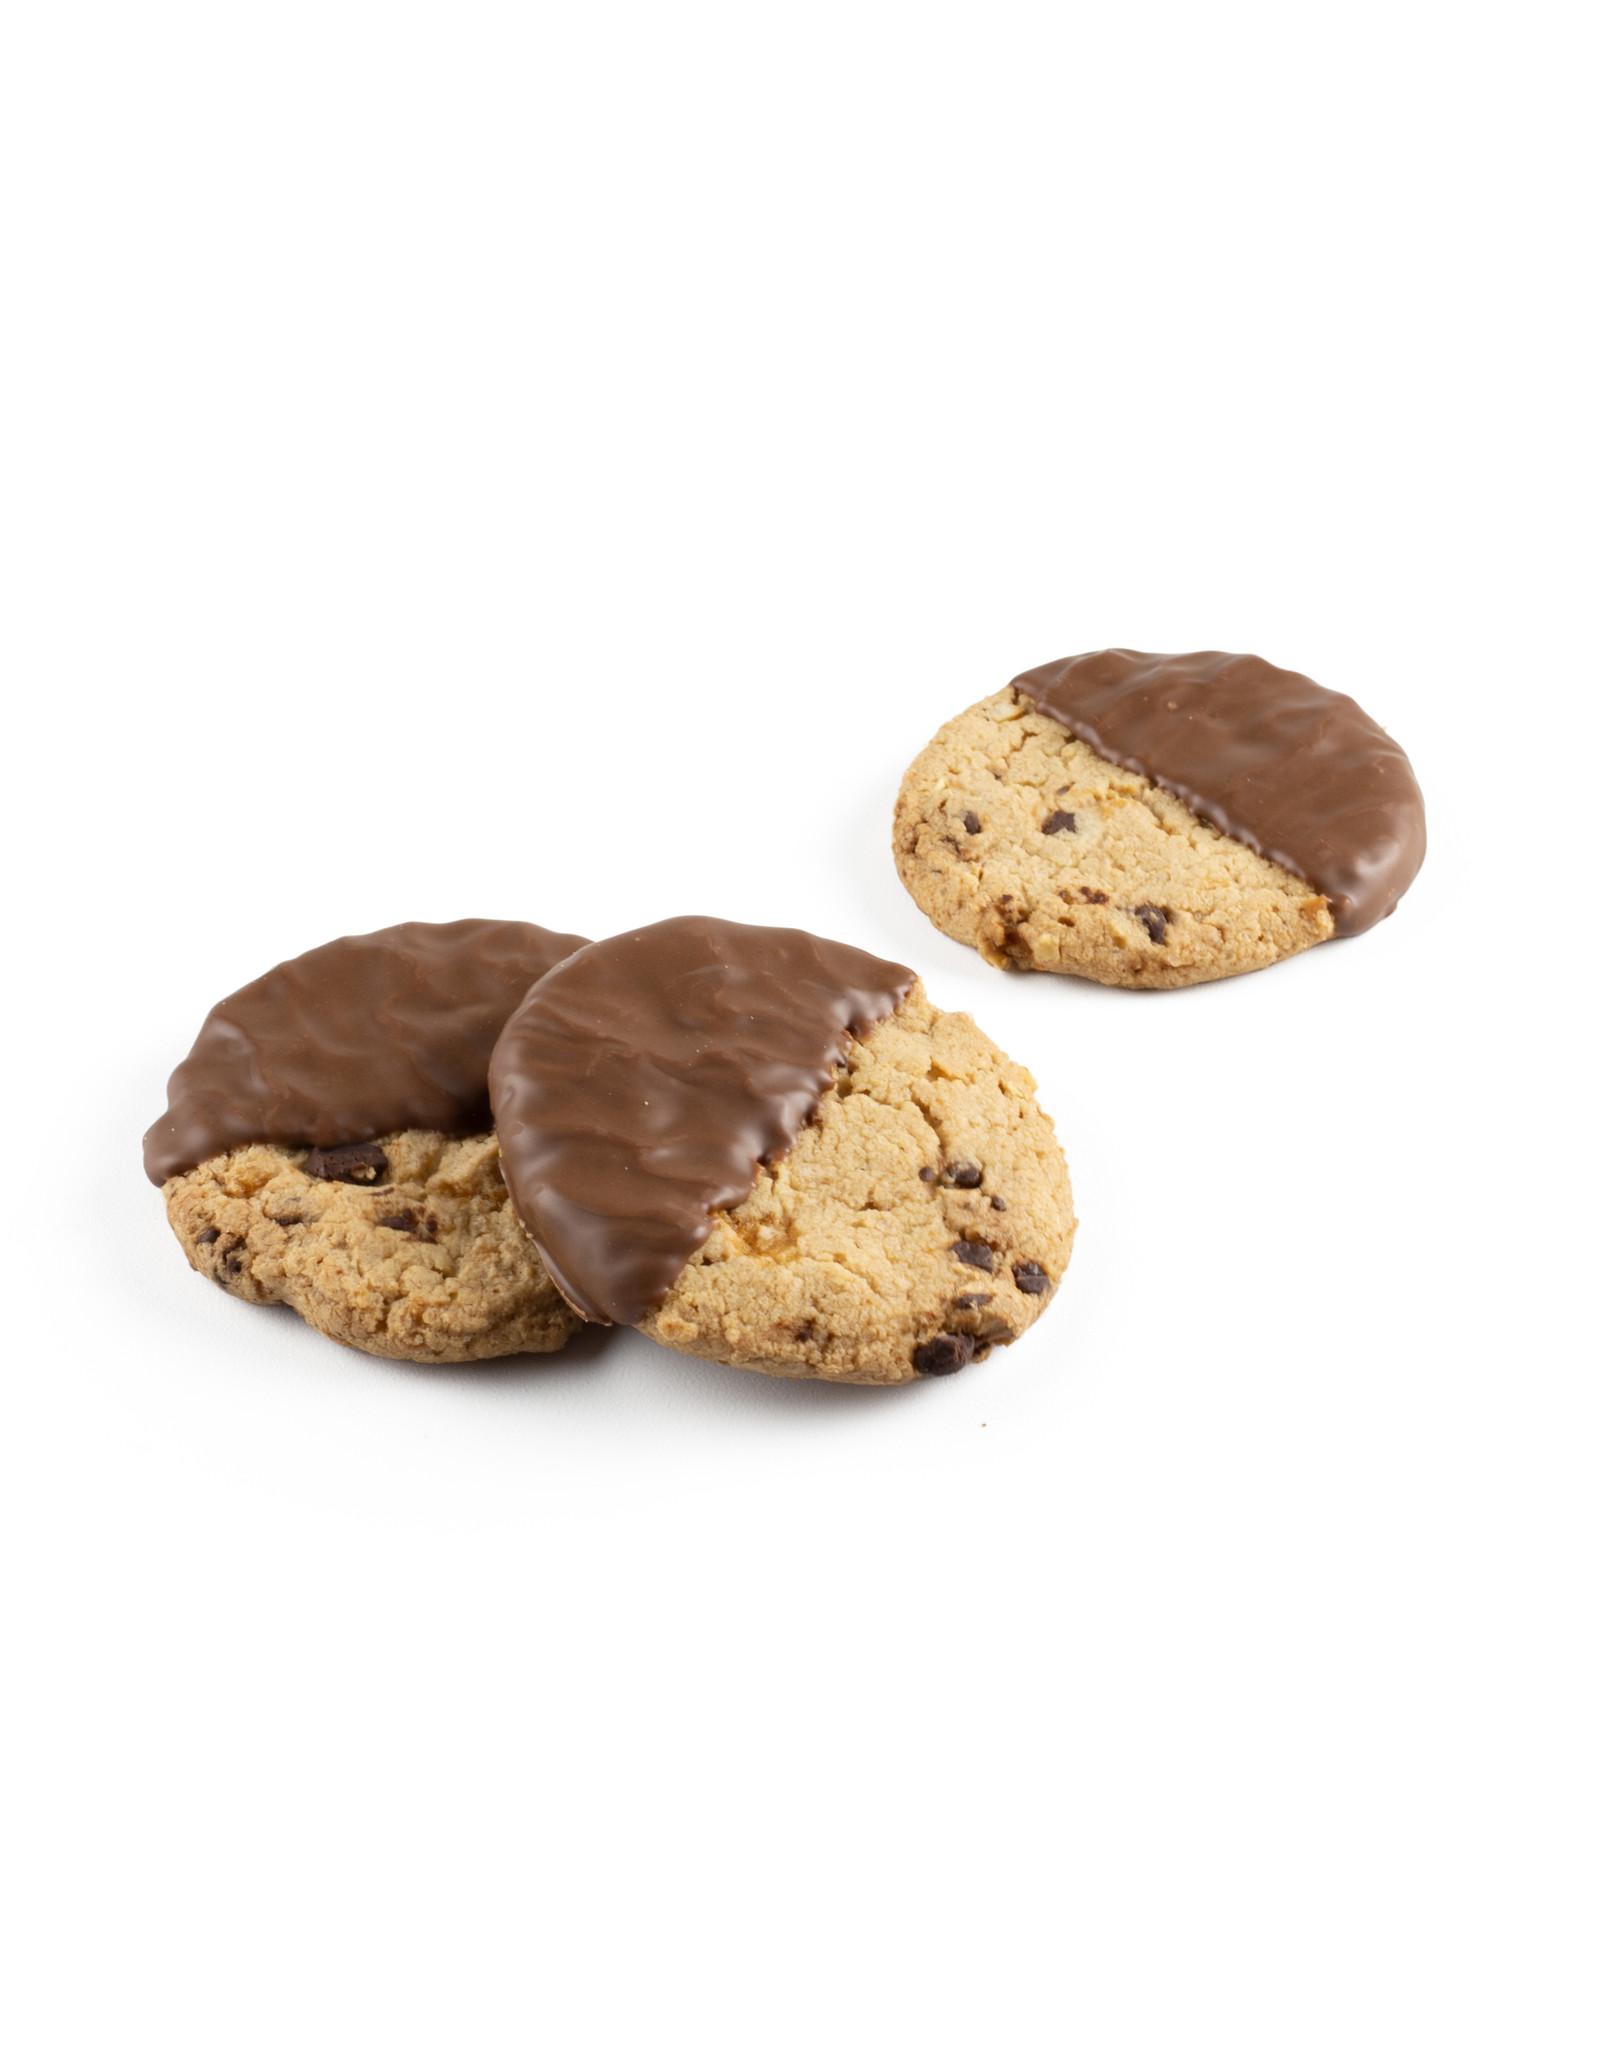 Hellema HELLEMA COUNTRY Cookies Hazelnut chocolate - 12x 175 grams - master carton